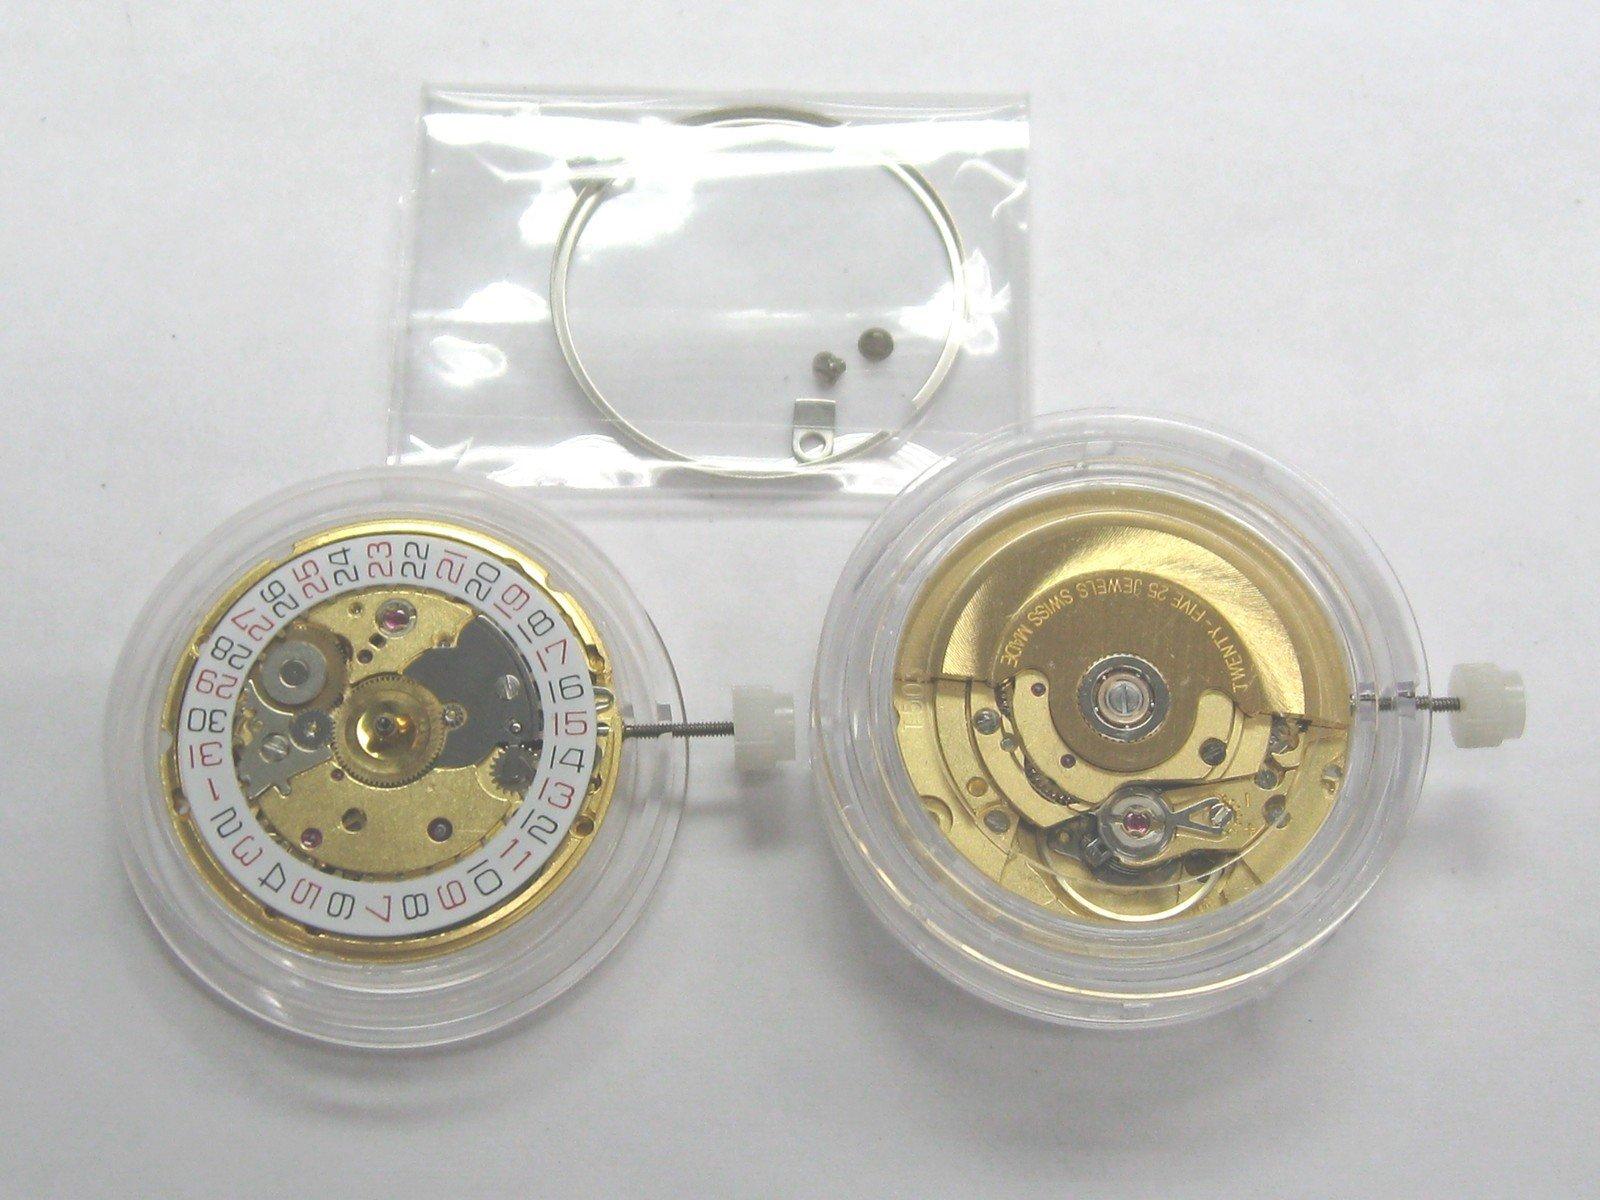 Watch Movement for ETA 2824-2 Auto Swiss Made Date Gold, 3h Gold